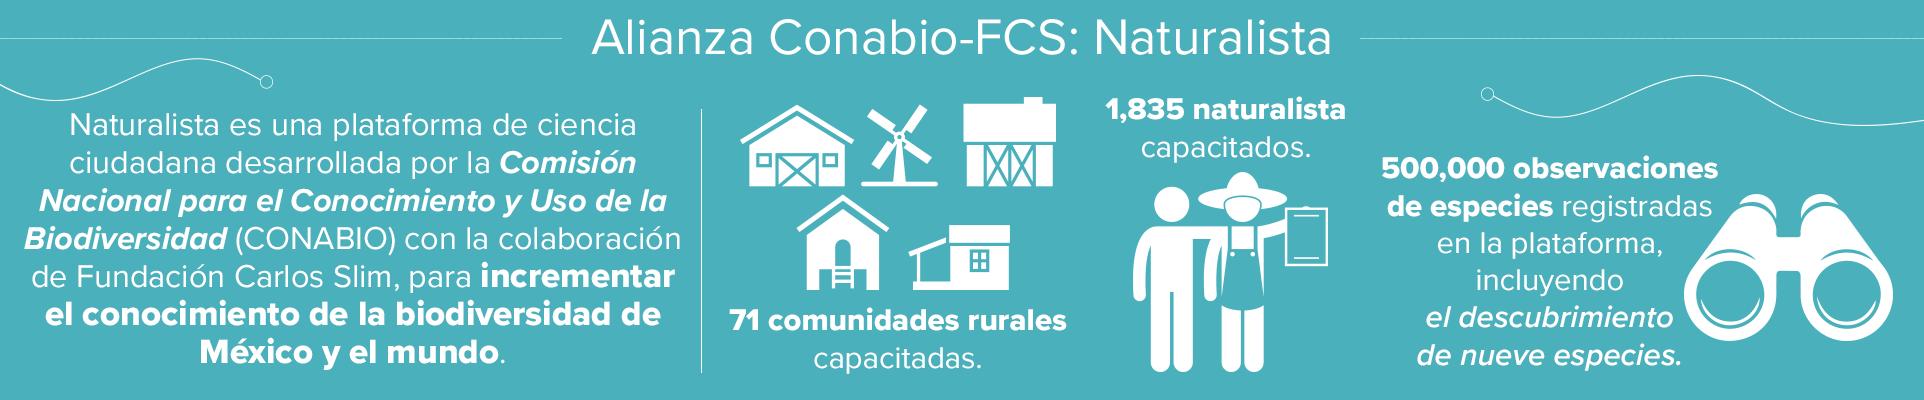 Alianza Conabio – FCS: Naturalista